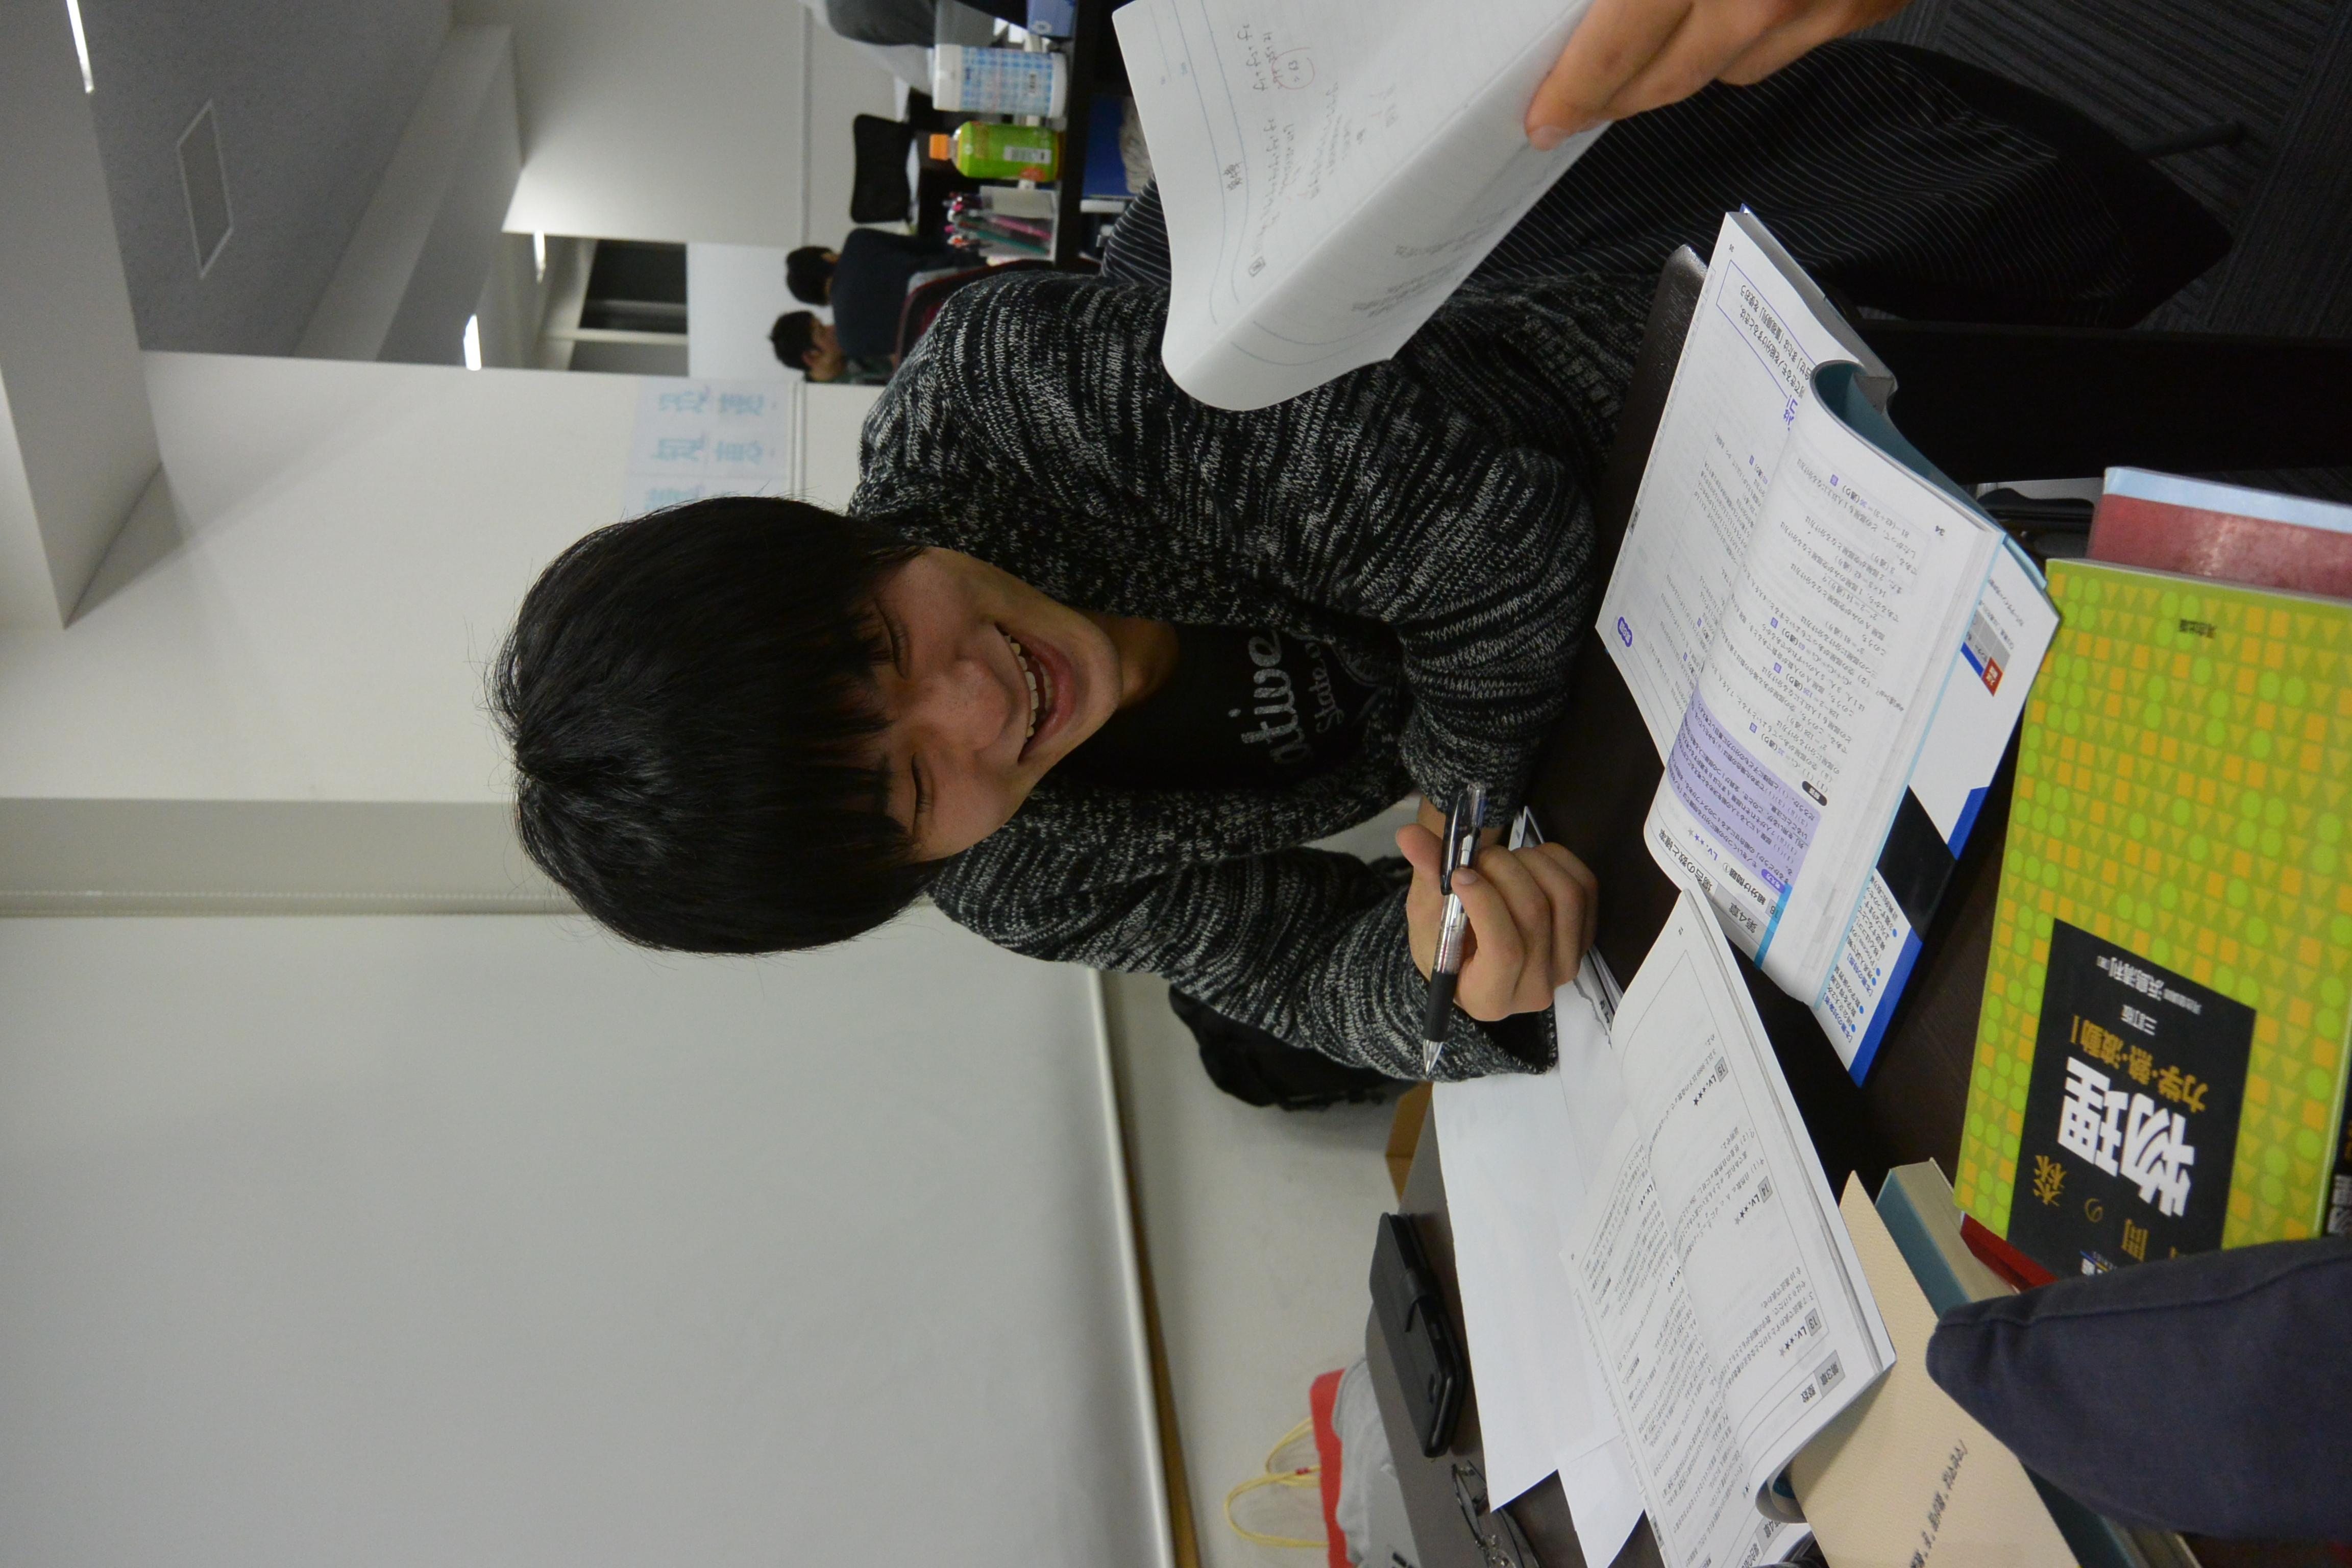 GRIP新鎌ヶ谷校の特徴は?!鎌ヶ谷市の学習塾・予備校情報